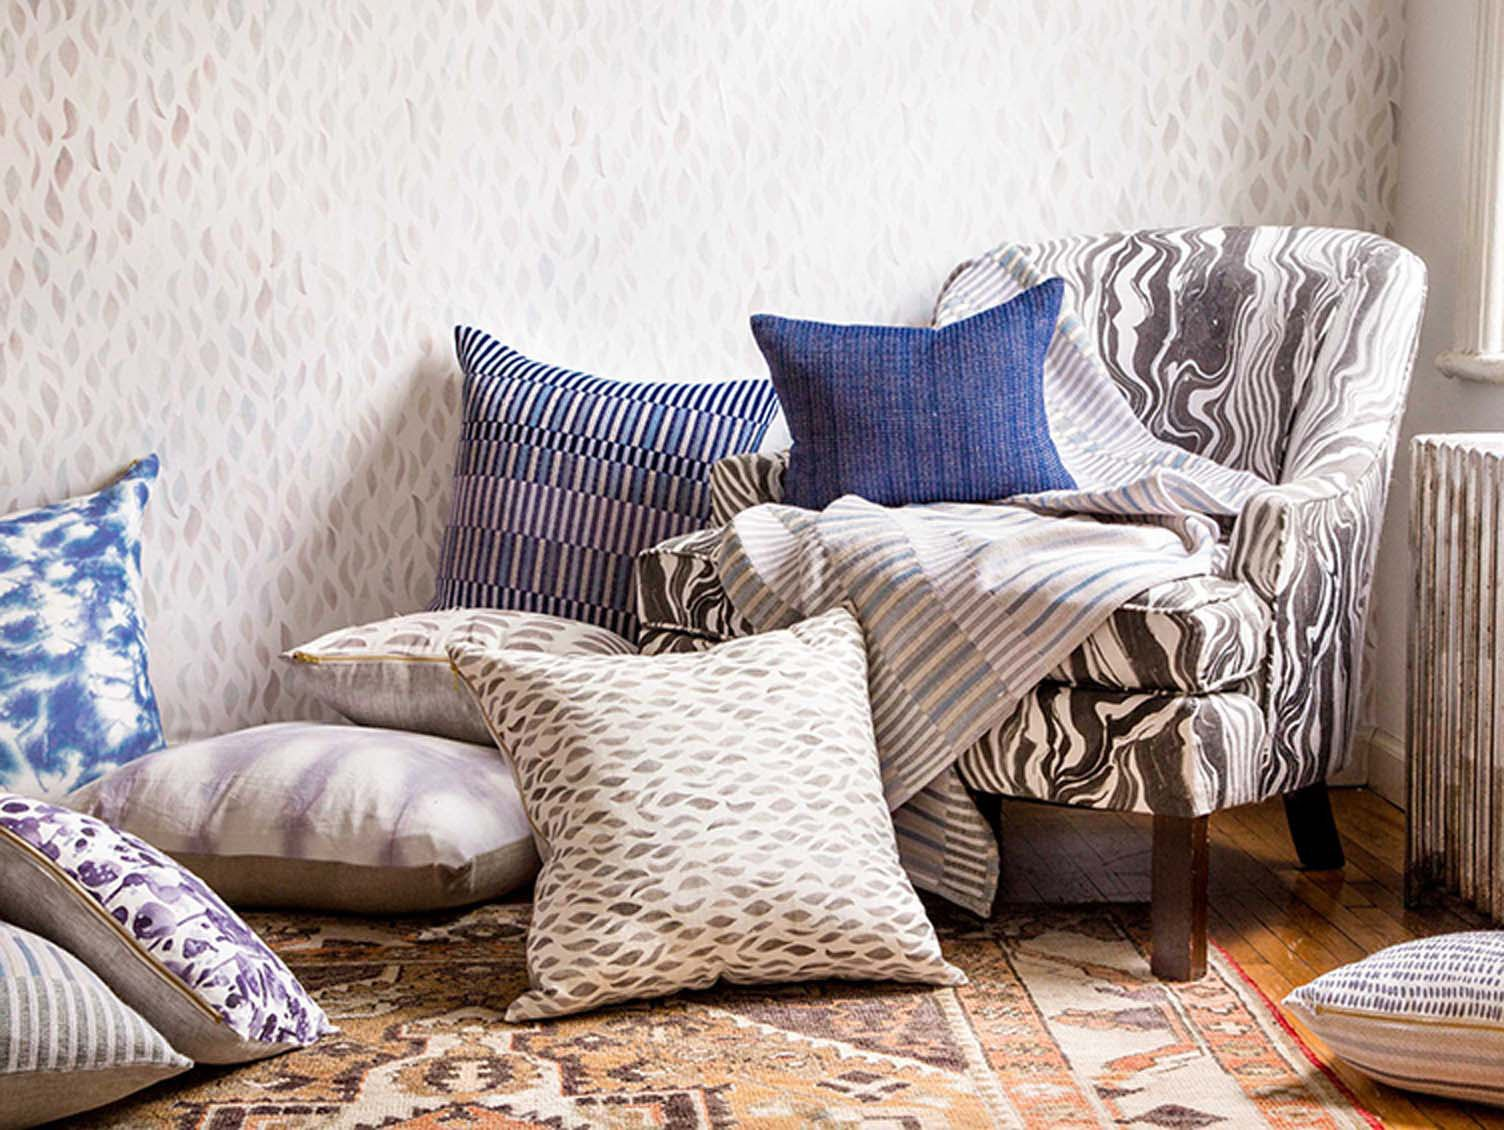 Rebeccca_Atwood_10_textile_photoByRenFuller